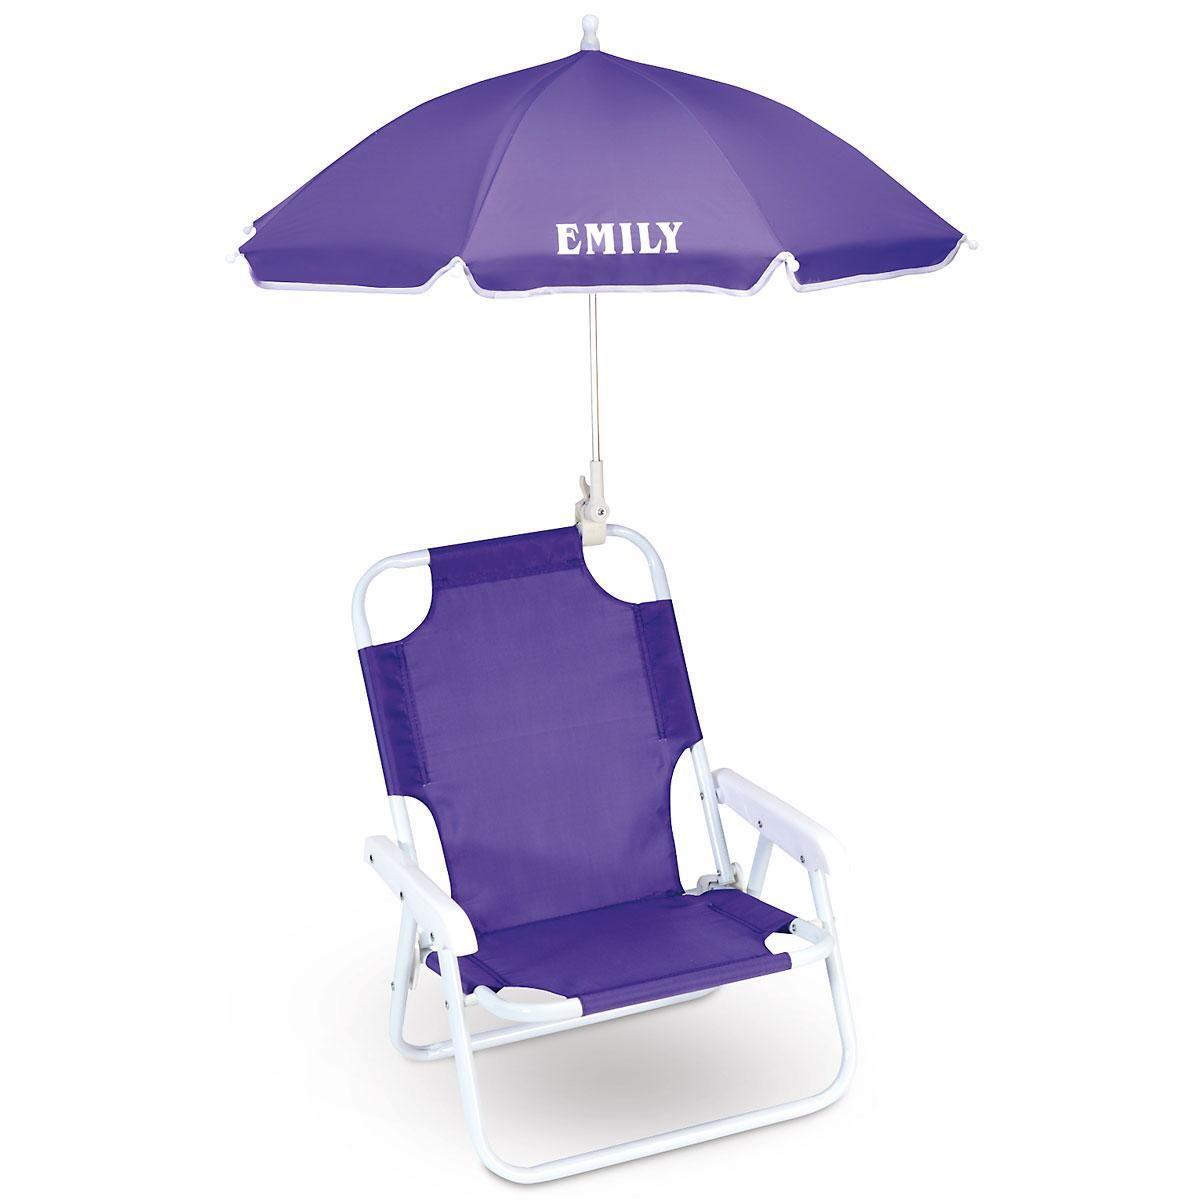 Umbrella Beach Chair For Kids Lillian Vernon